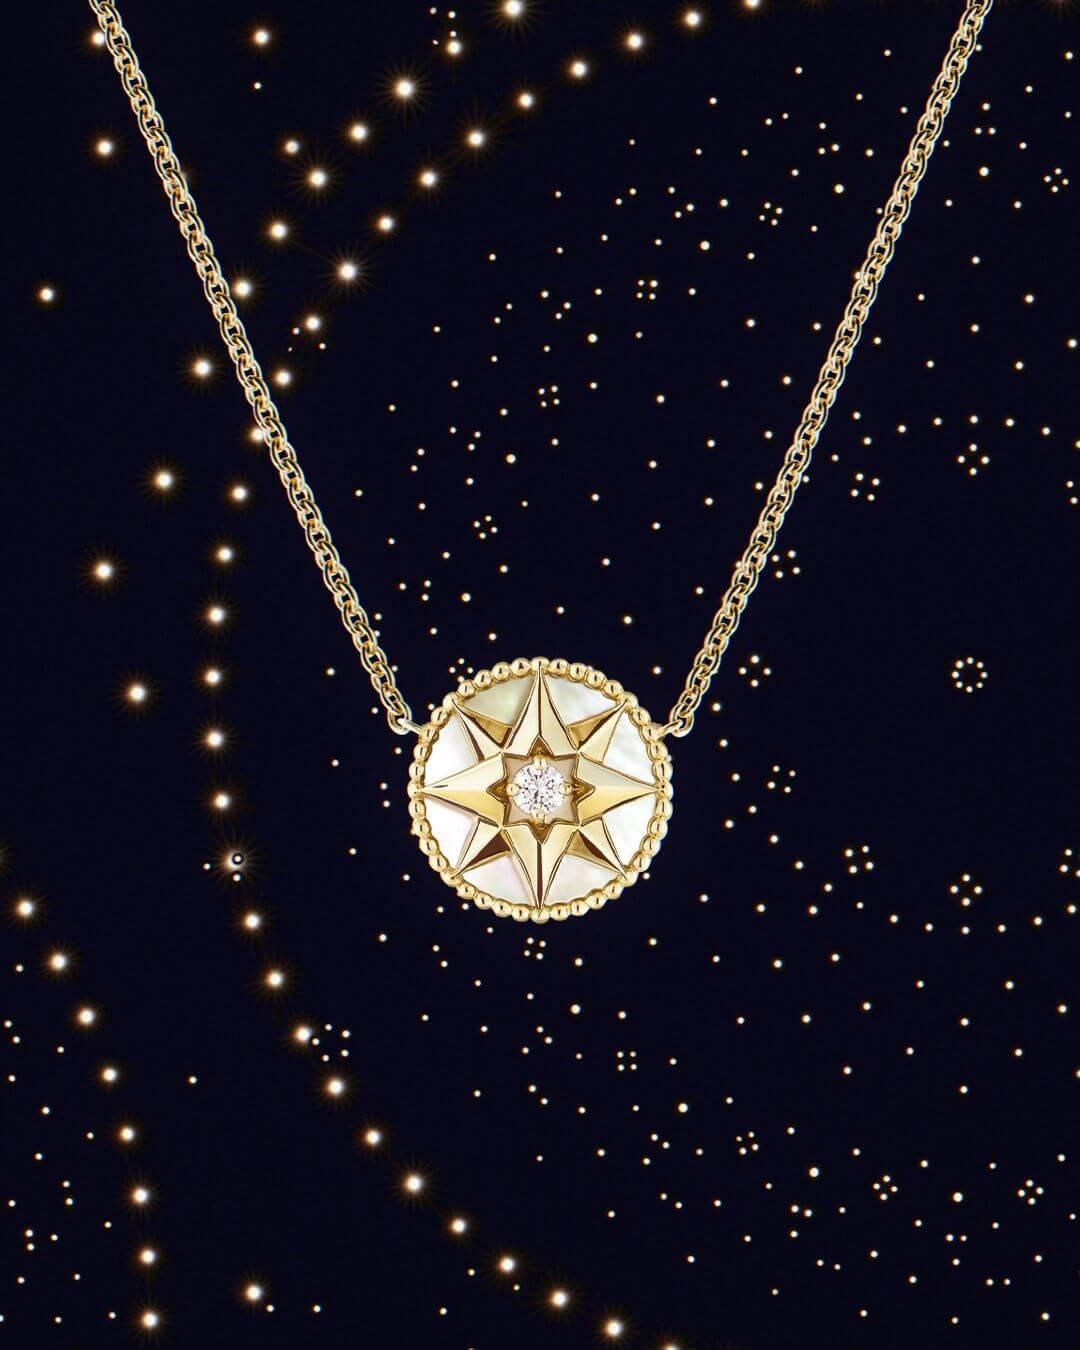 Dior Joaillerie mücevher görseller